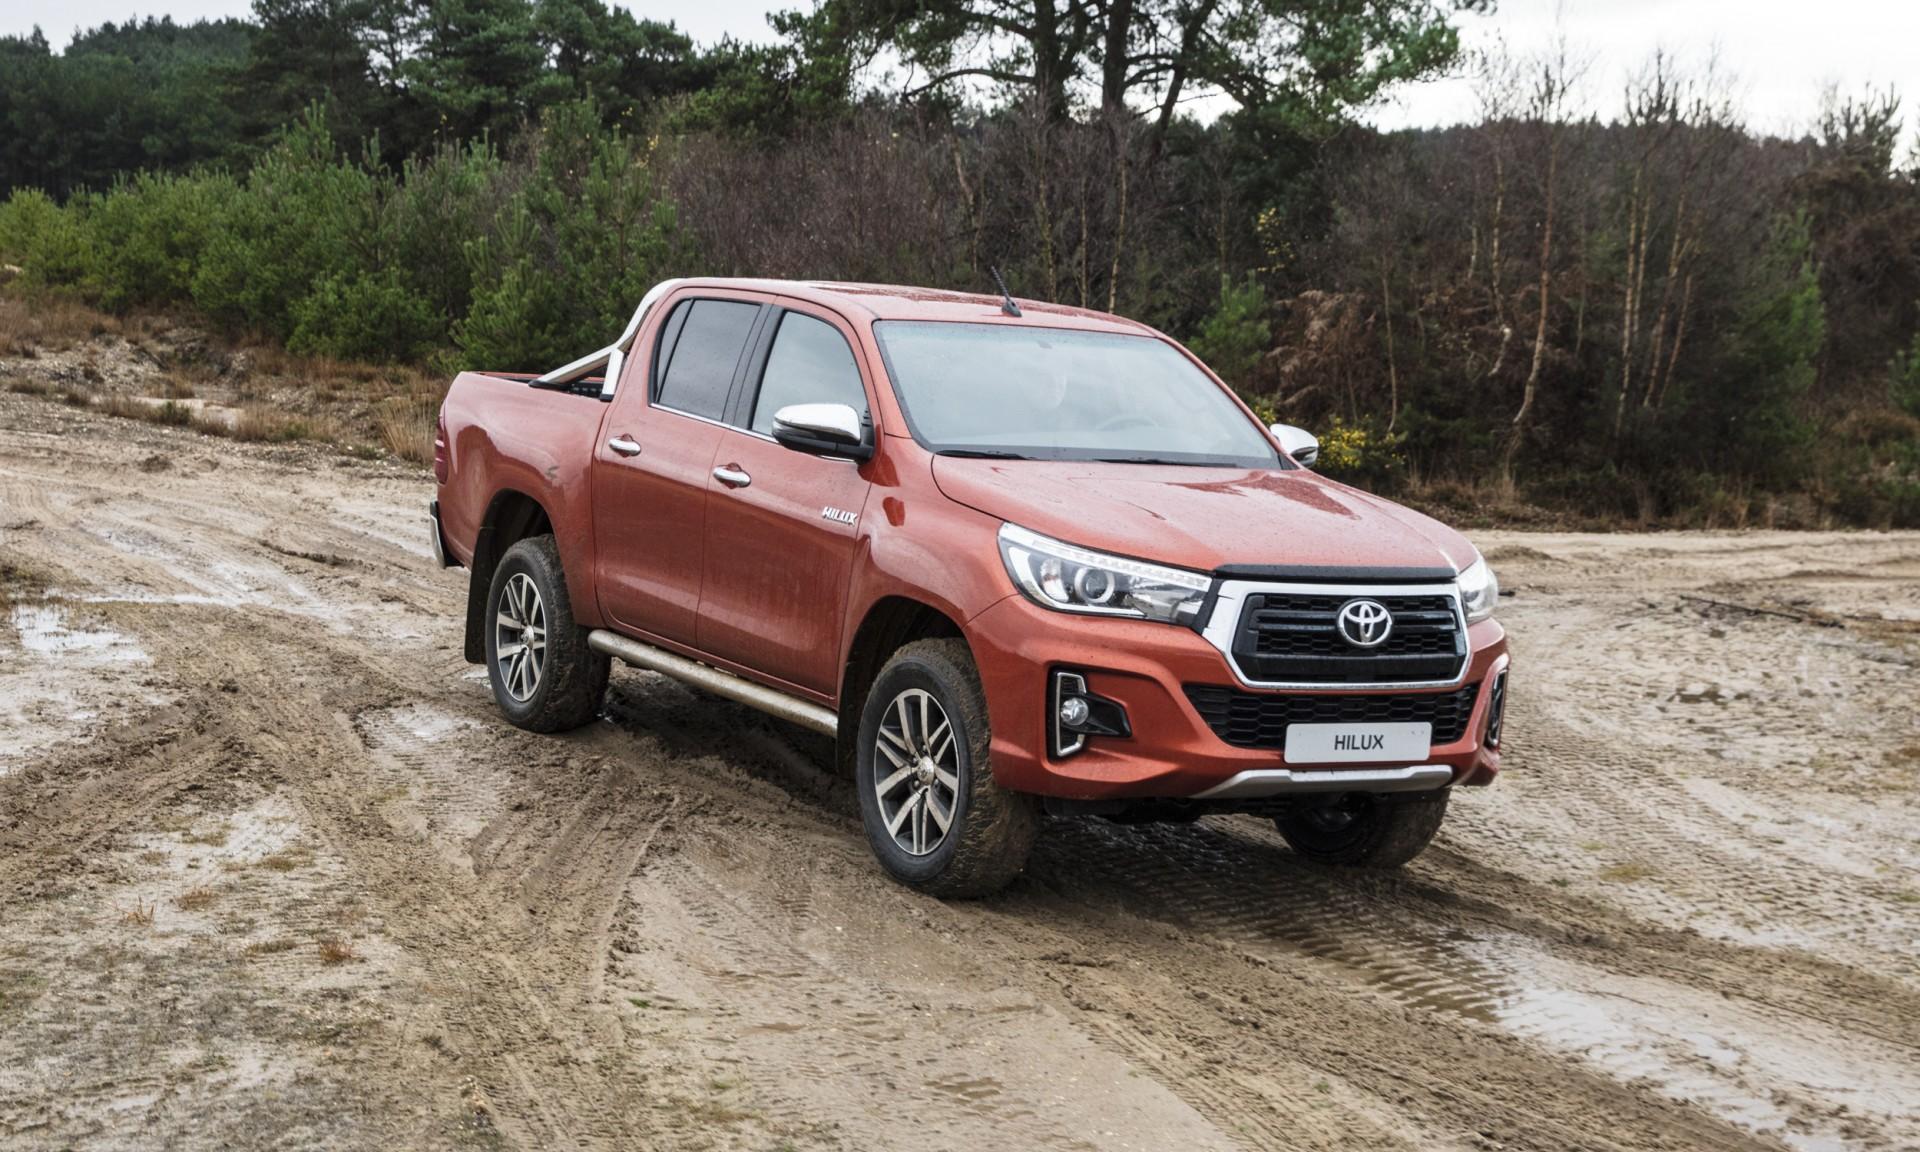 Kelebihan Toyota Hilux 2018 Harga